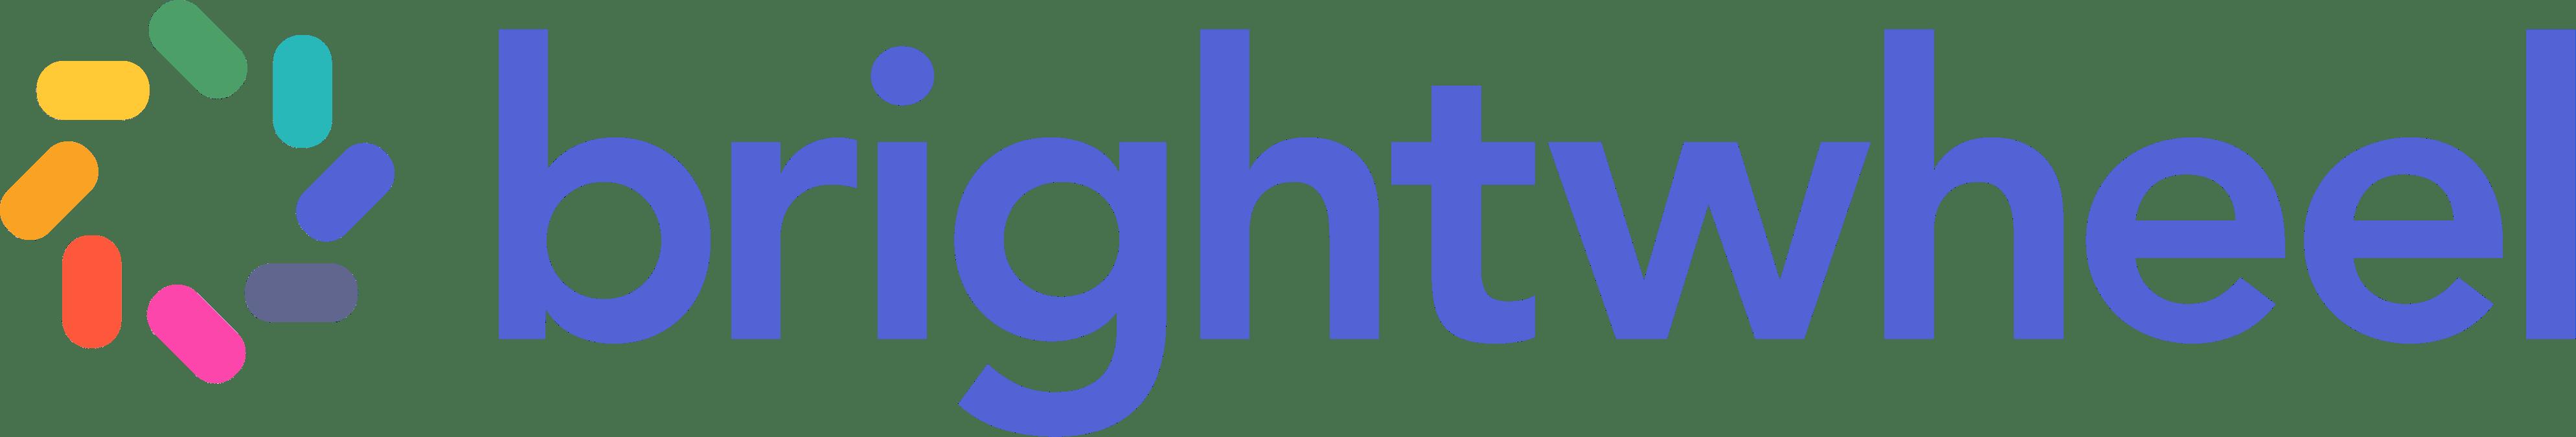 Brightwheel company logo